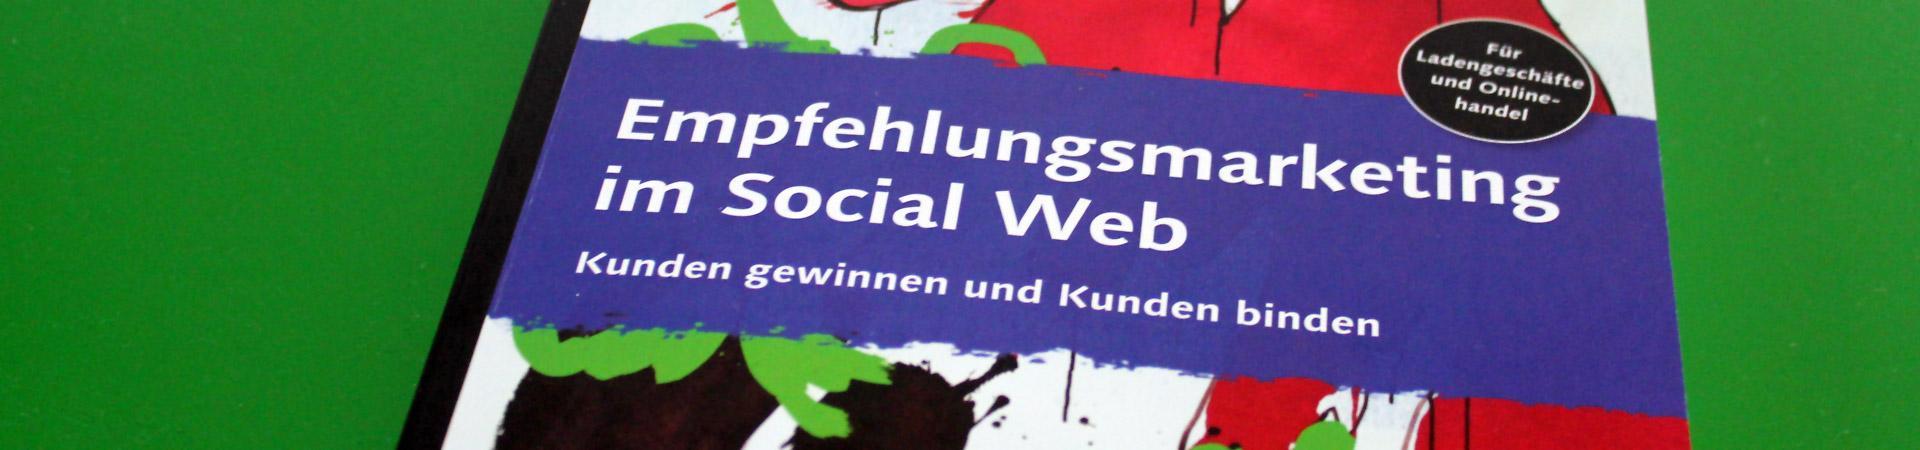 Buchrezension: Empfehlungsmarketing im Social Web